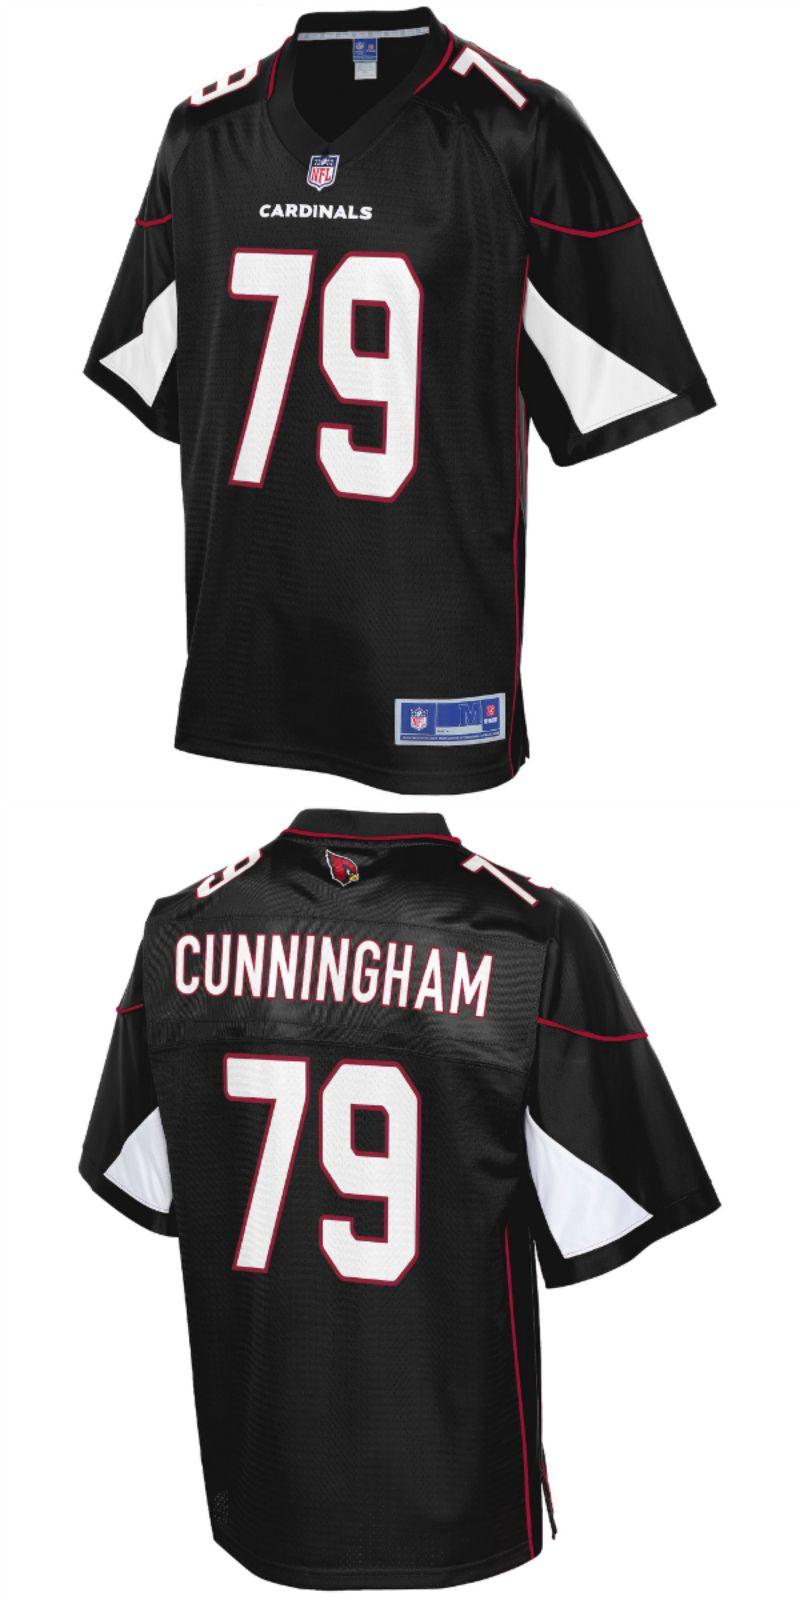 e9283b79 Korey Cunningham Arizona Cardinals NFL Pro Line Alternate Player ...